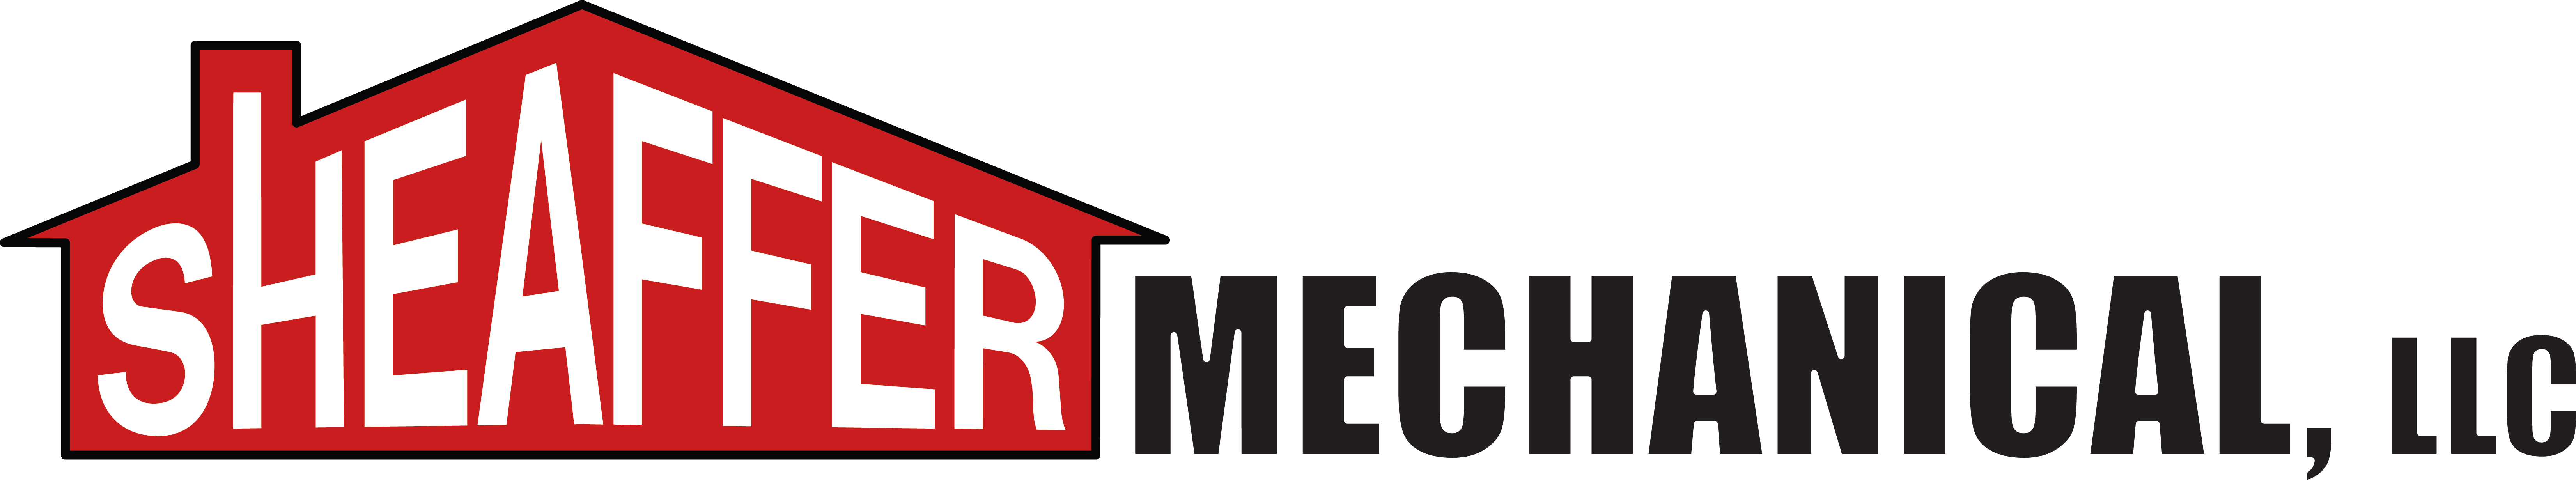 Sheaffer Mechanical, LLC